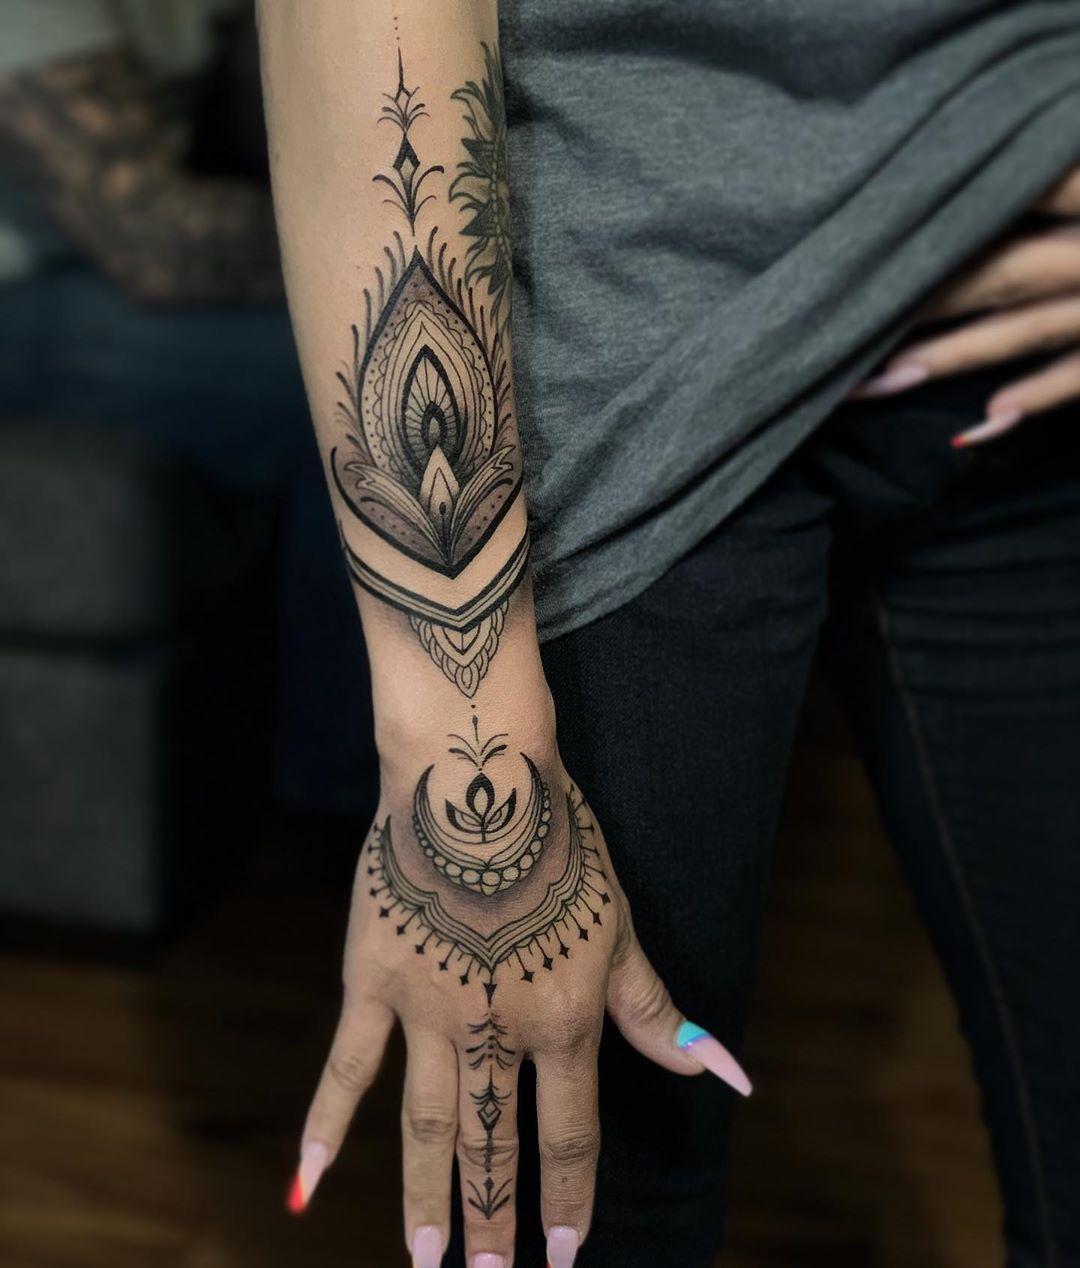 Classic Hawaiian tattoo done in henna